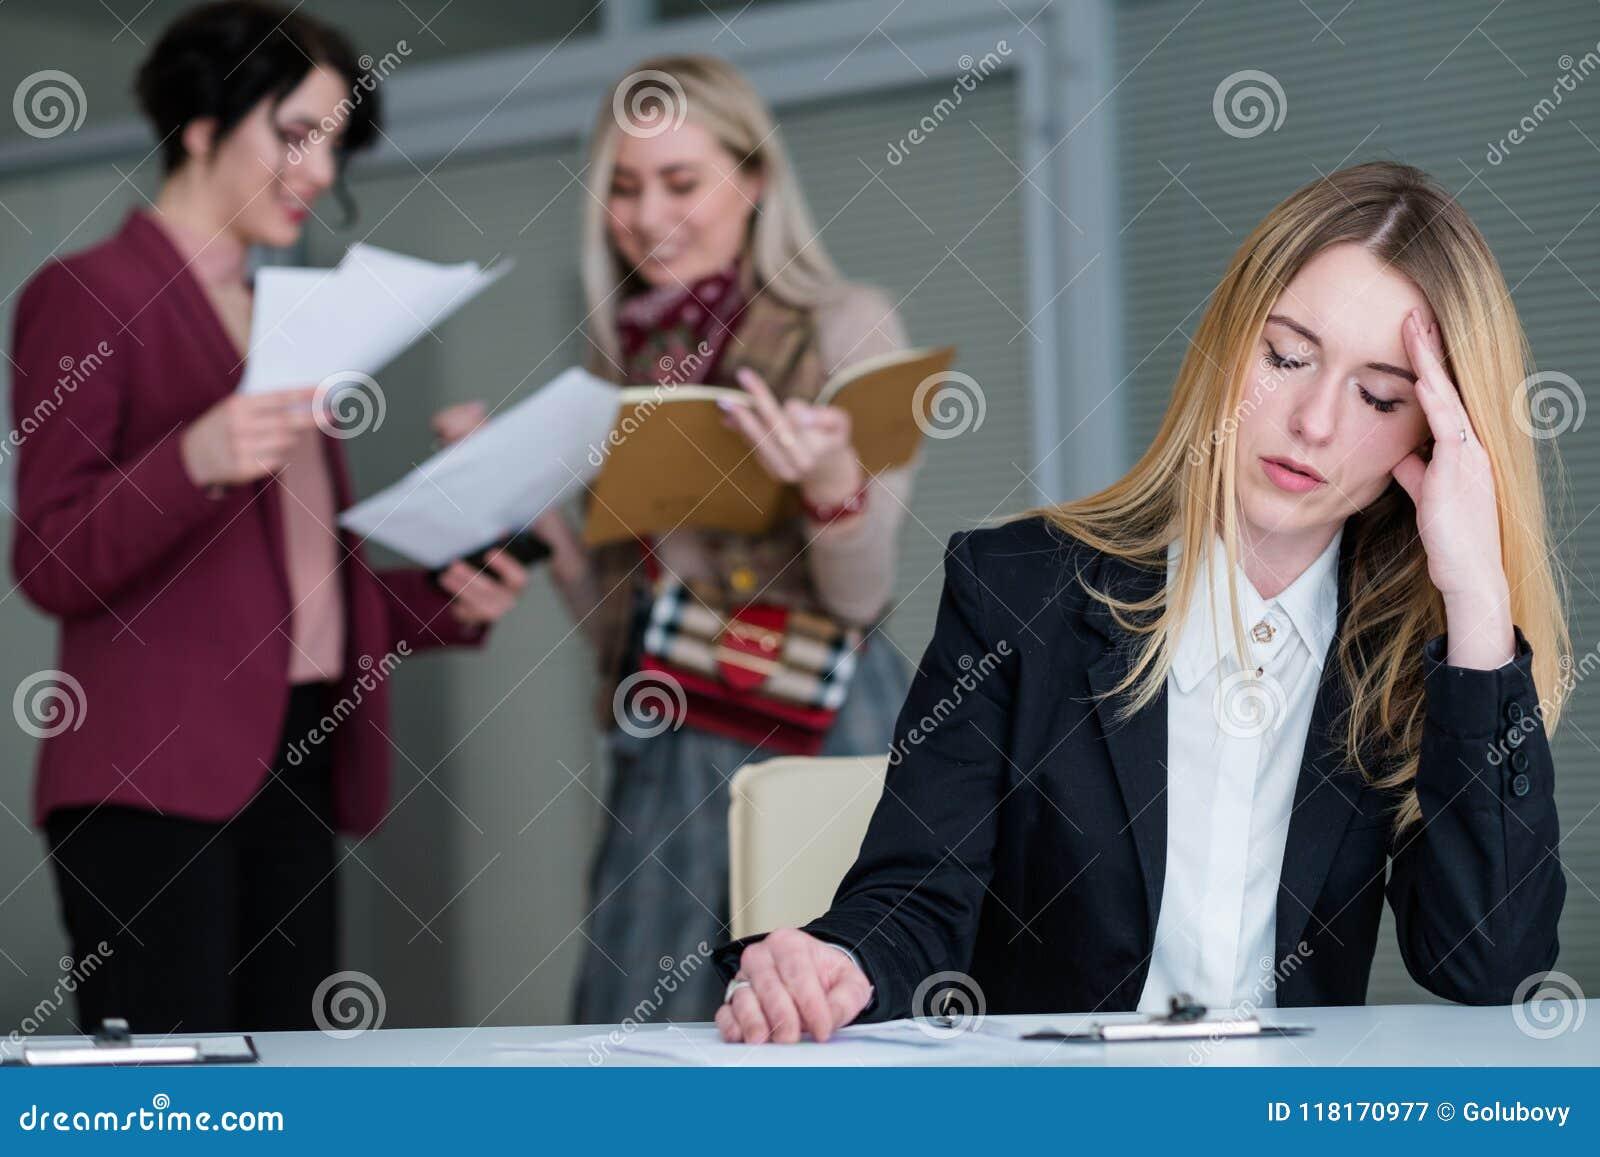 Office buzz woman headache noisy workspace